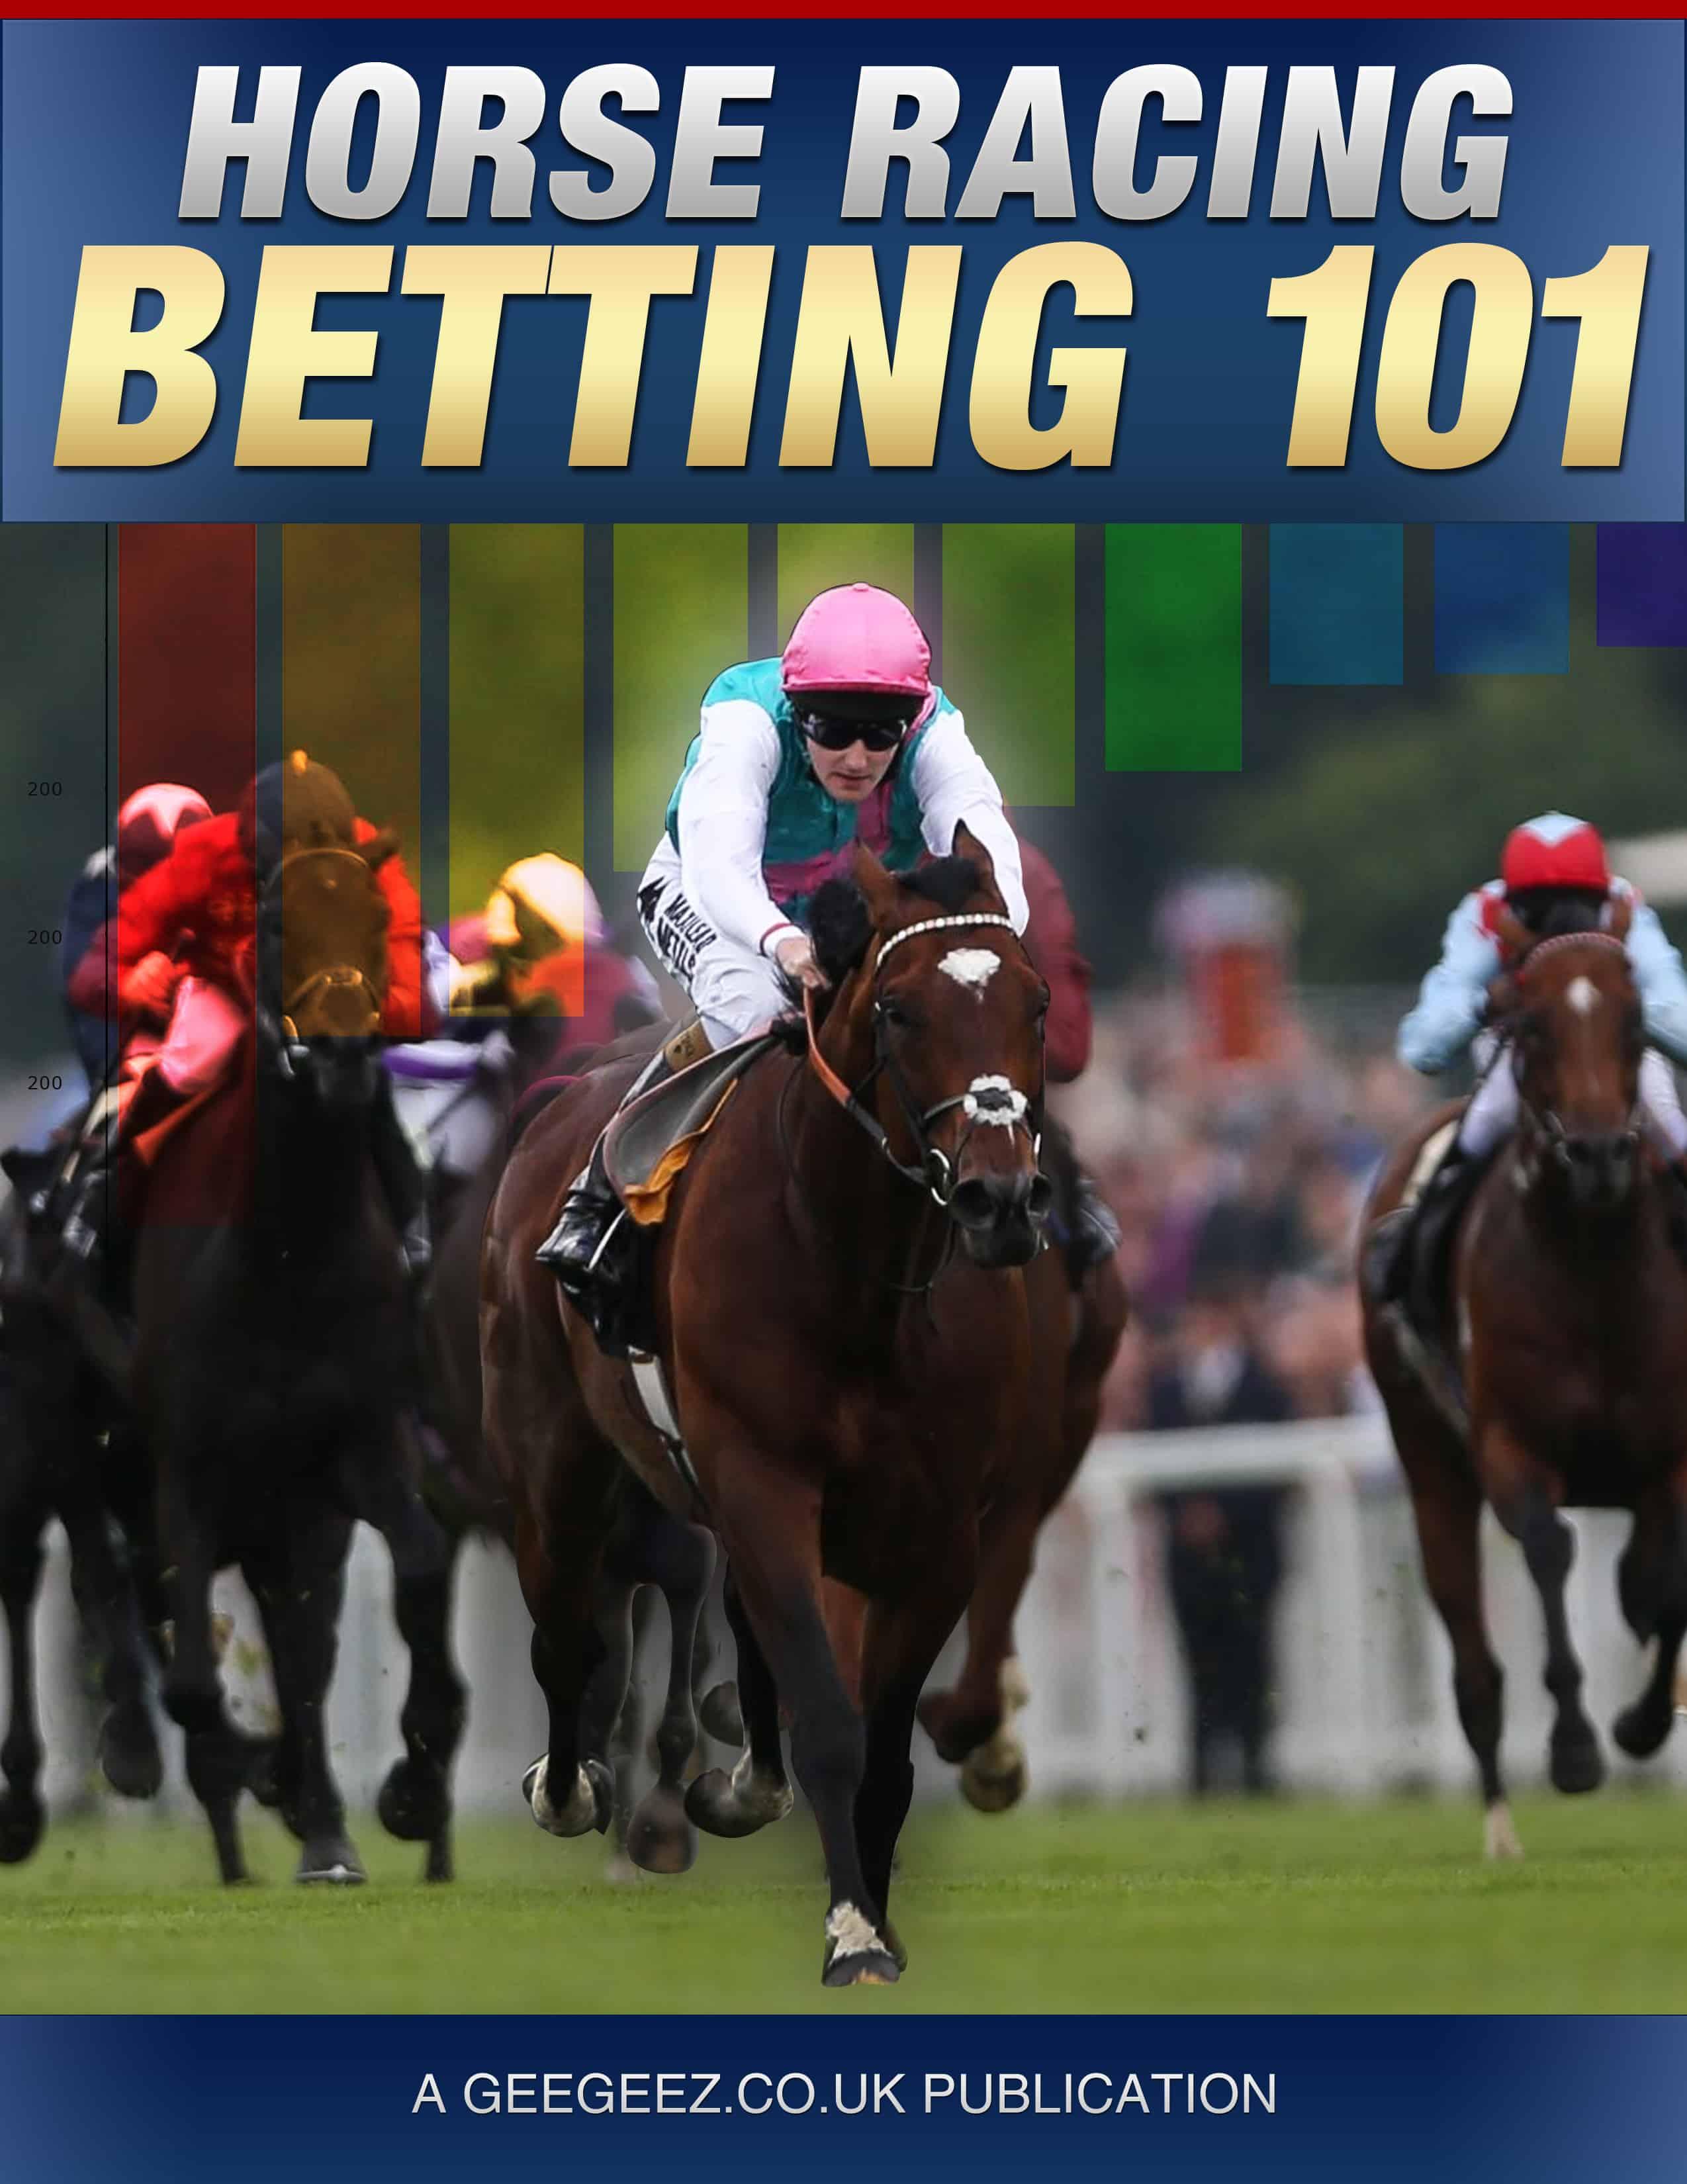 Download: Horse Racing Betting 101